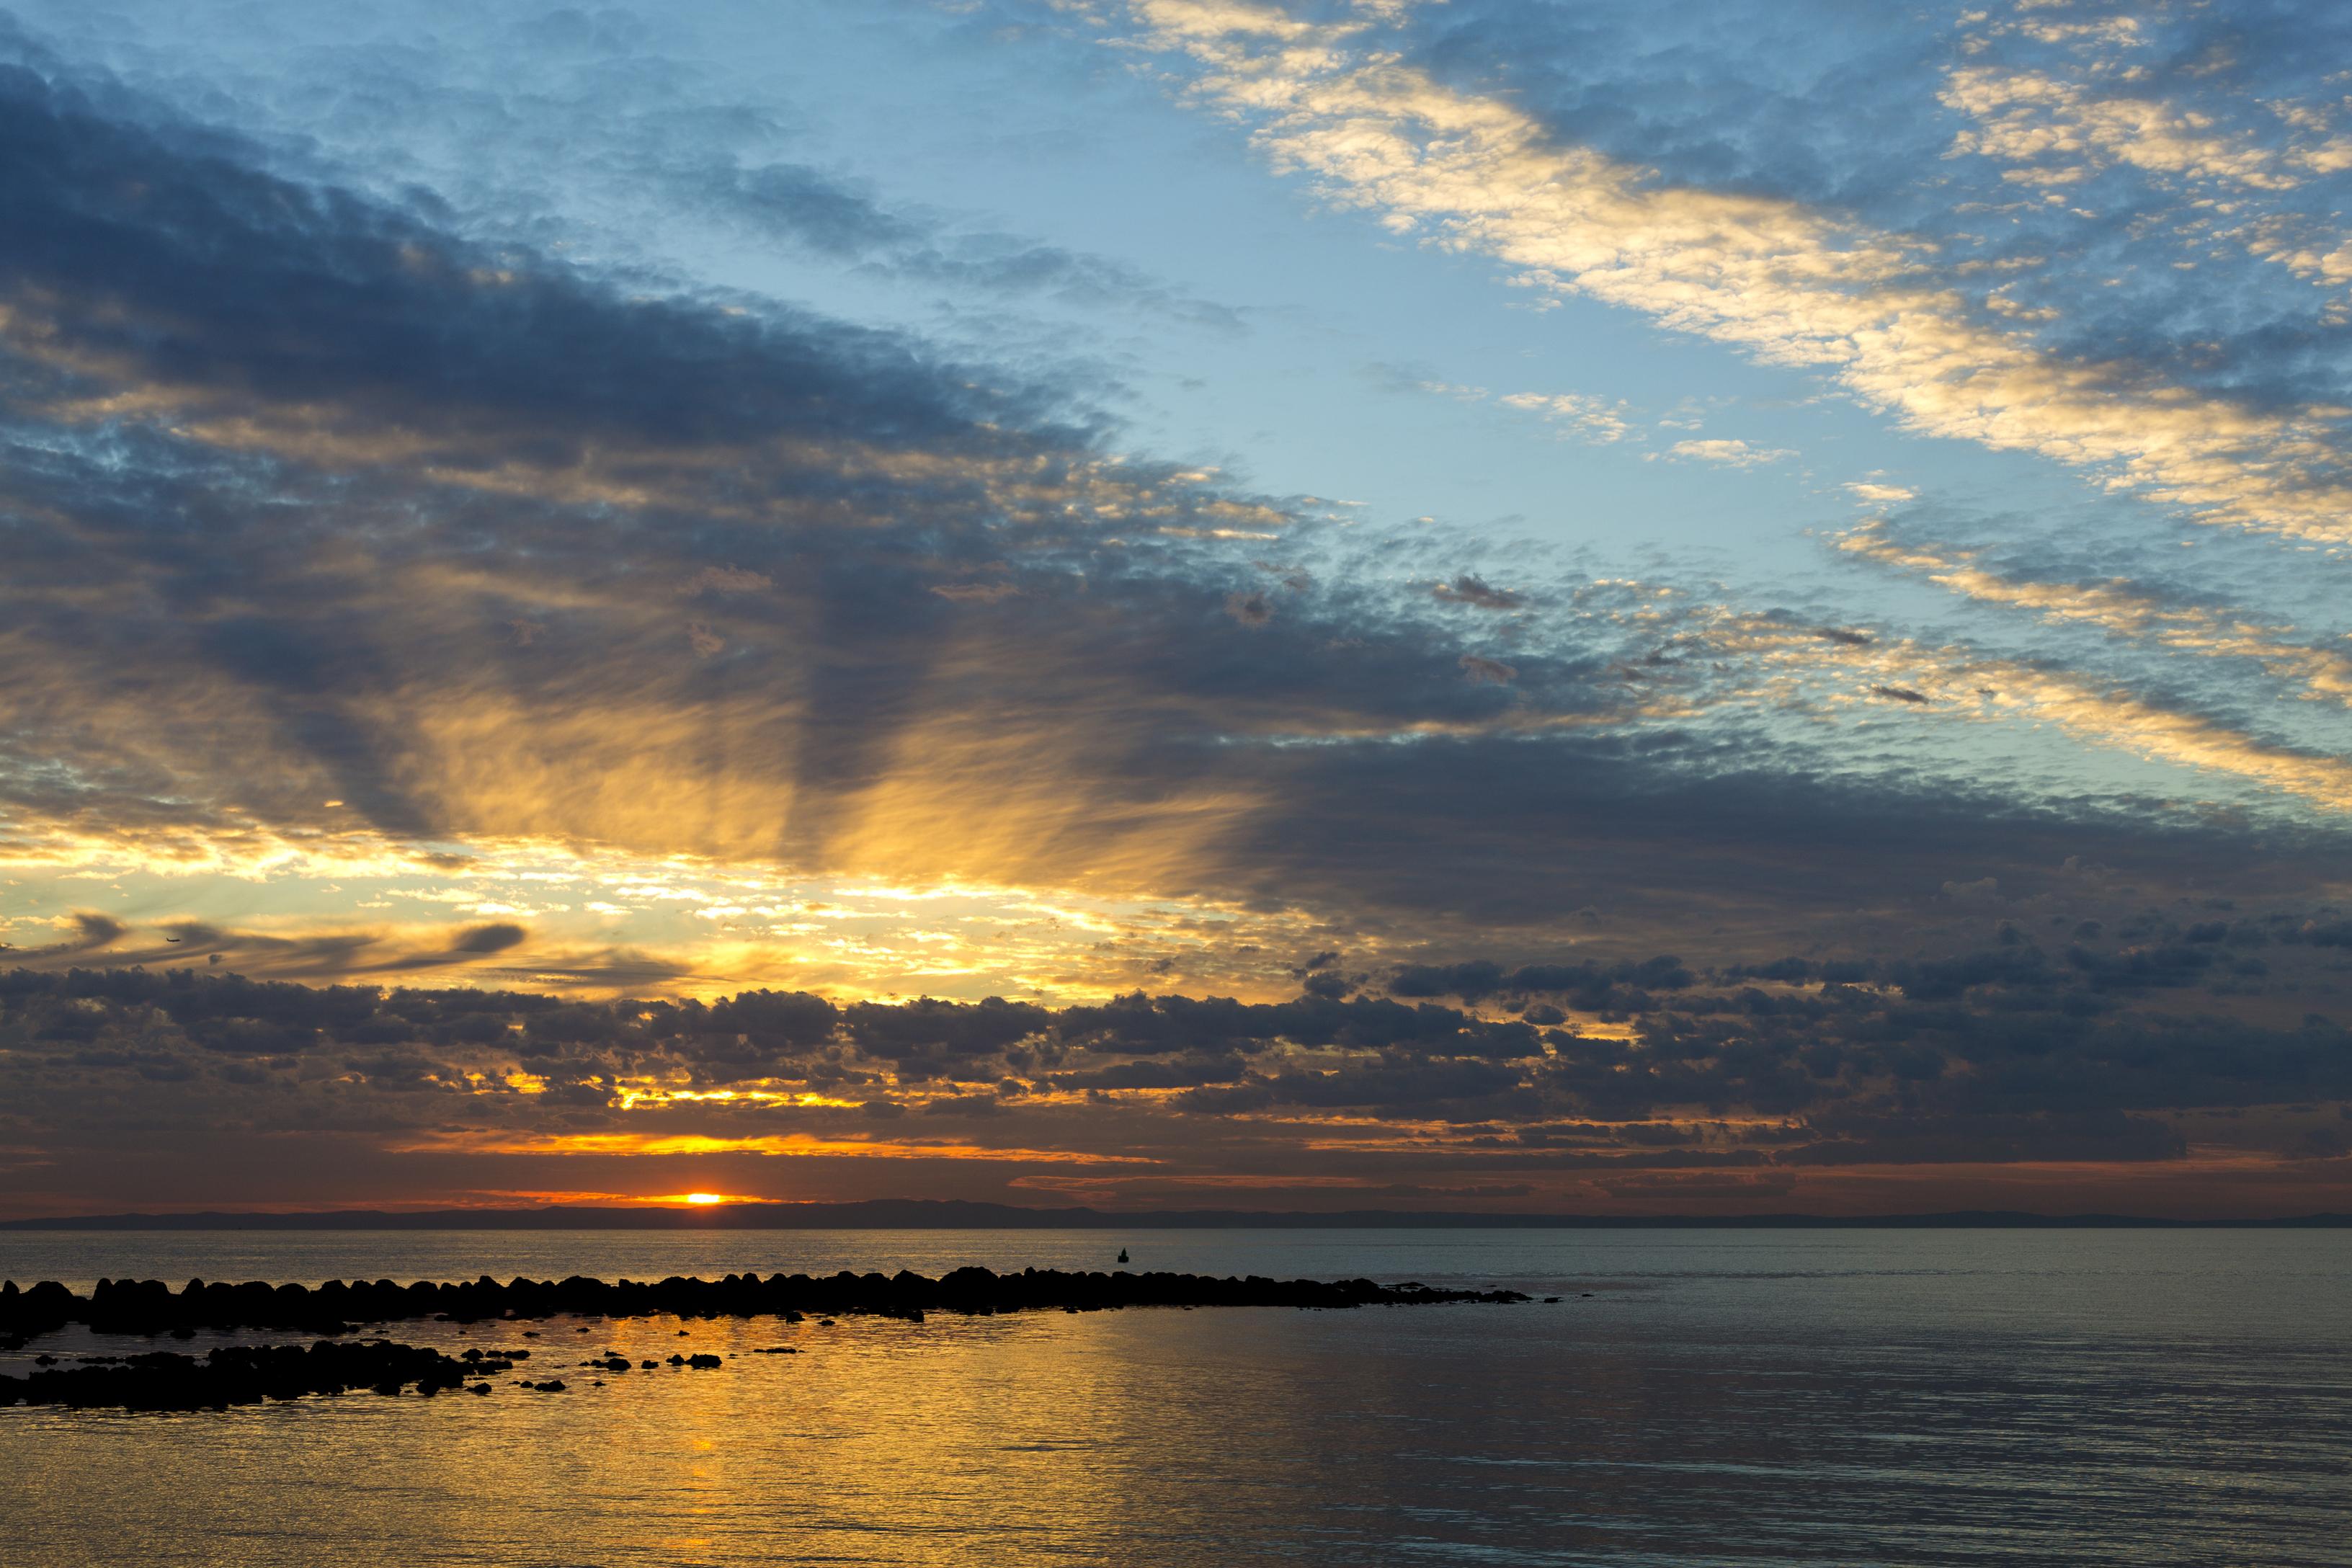 Фото Австралия Queensland Море Природа Небо рассвет и закат облачно 3264x2176 Рассветы и закаты облако Облака